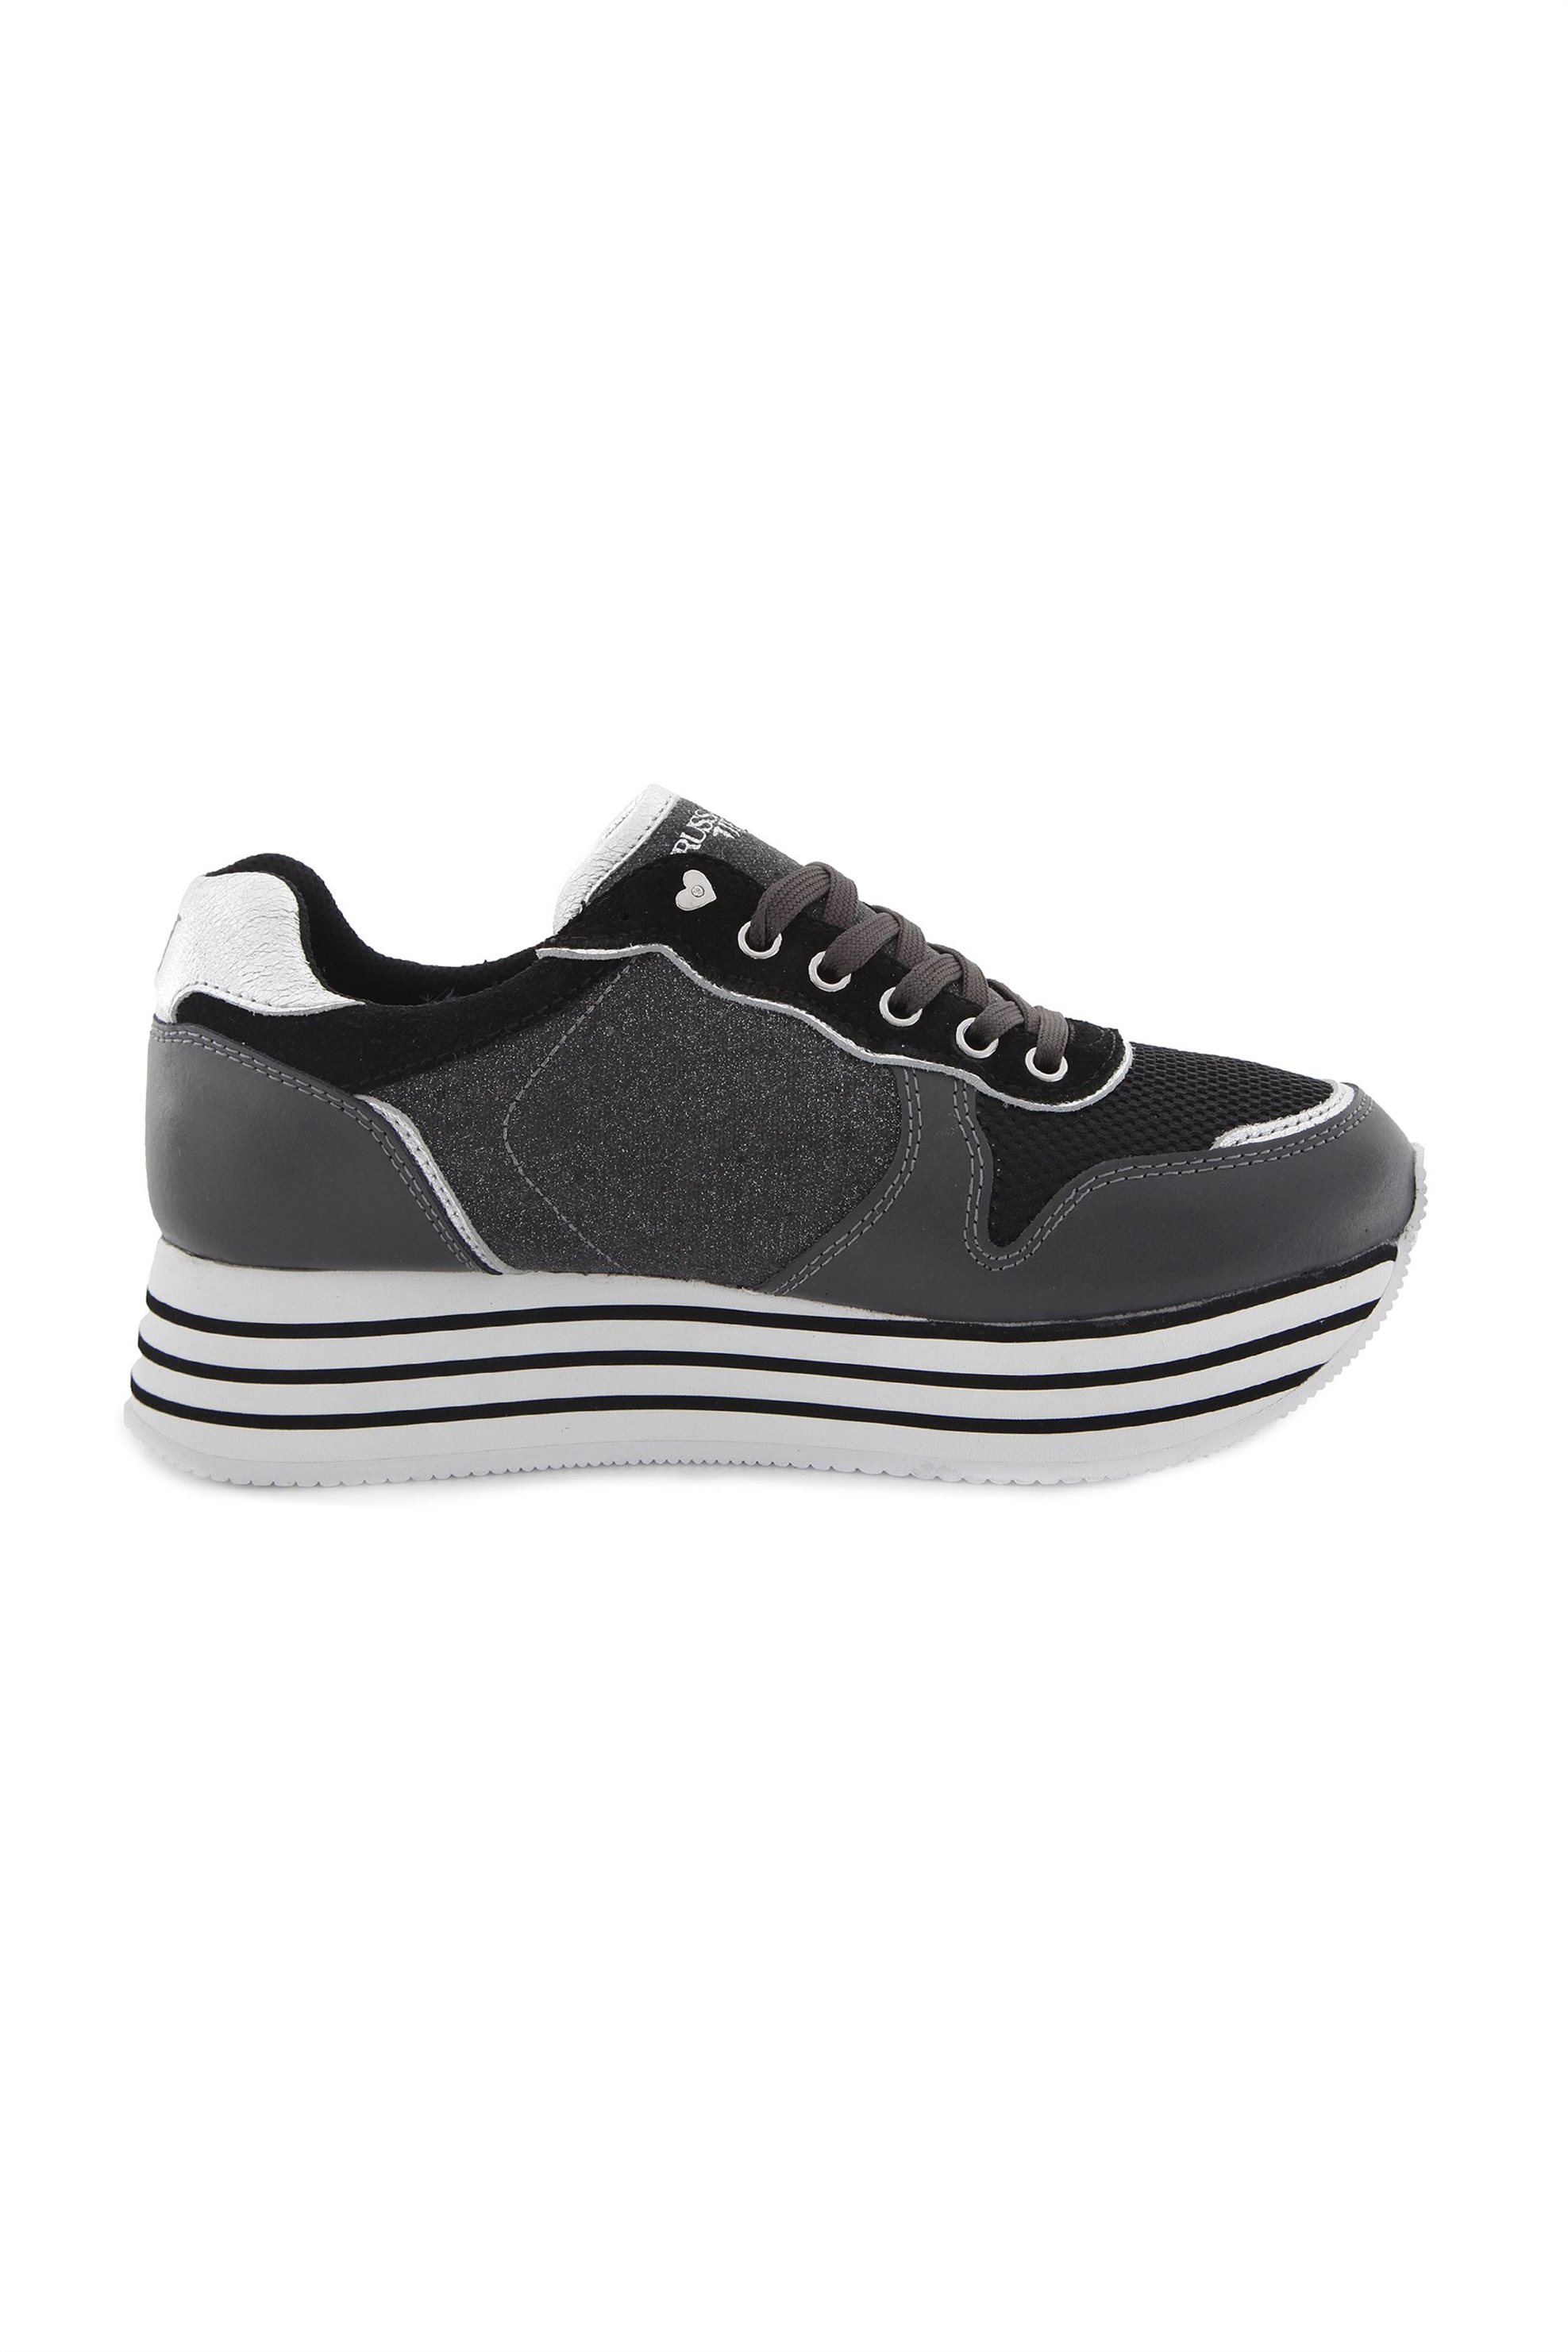 Trussardi γυναικεία sneakers δίσολα – 79A00246-9Y099999 – Μαυρο